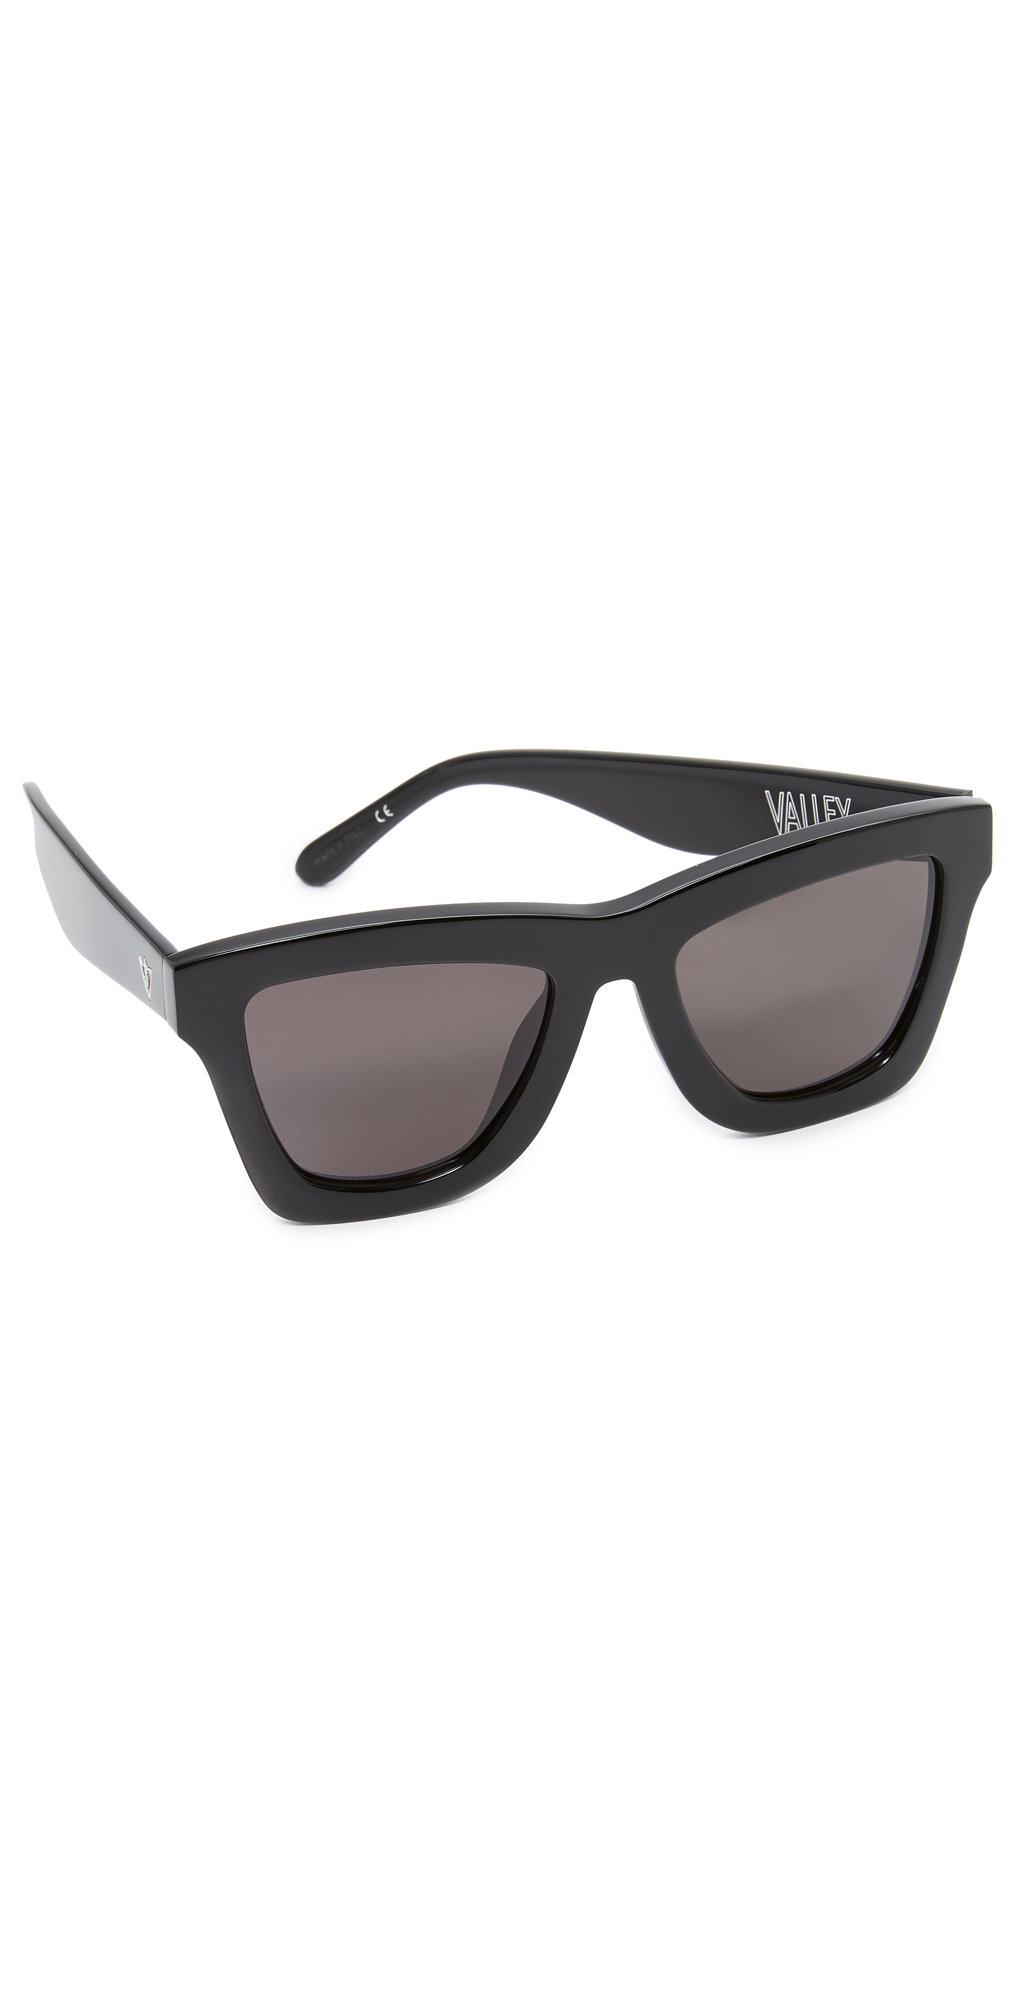 The DB II Petite Sunglasses Valley Eyewear